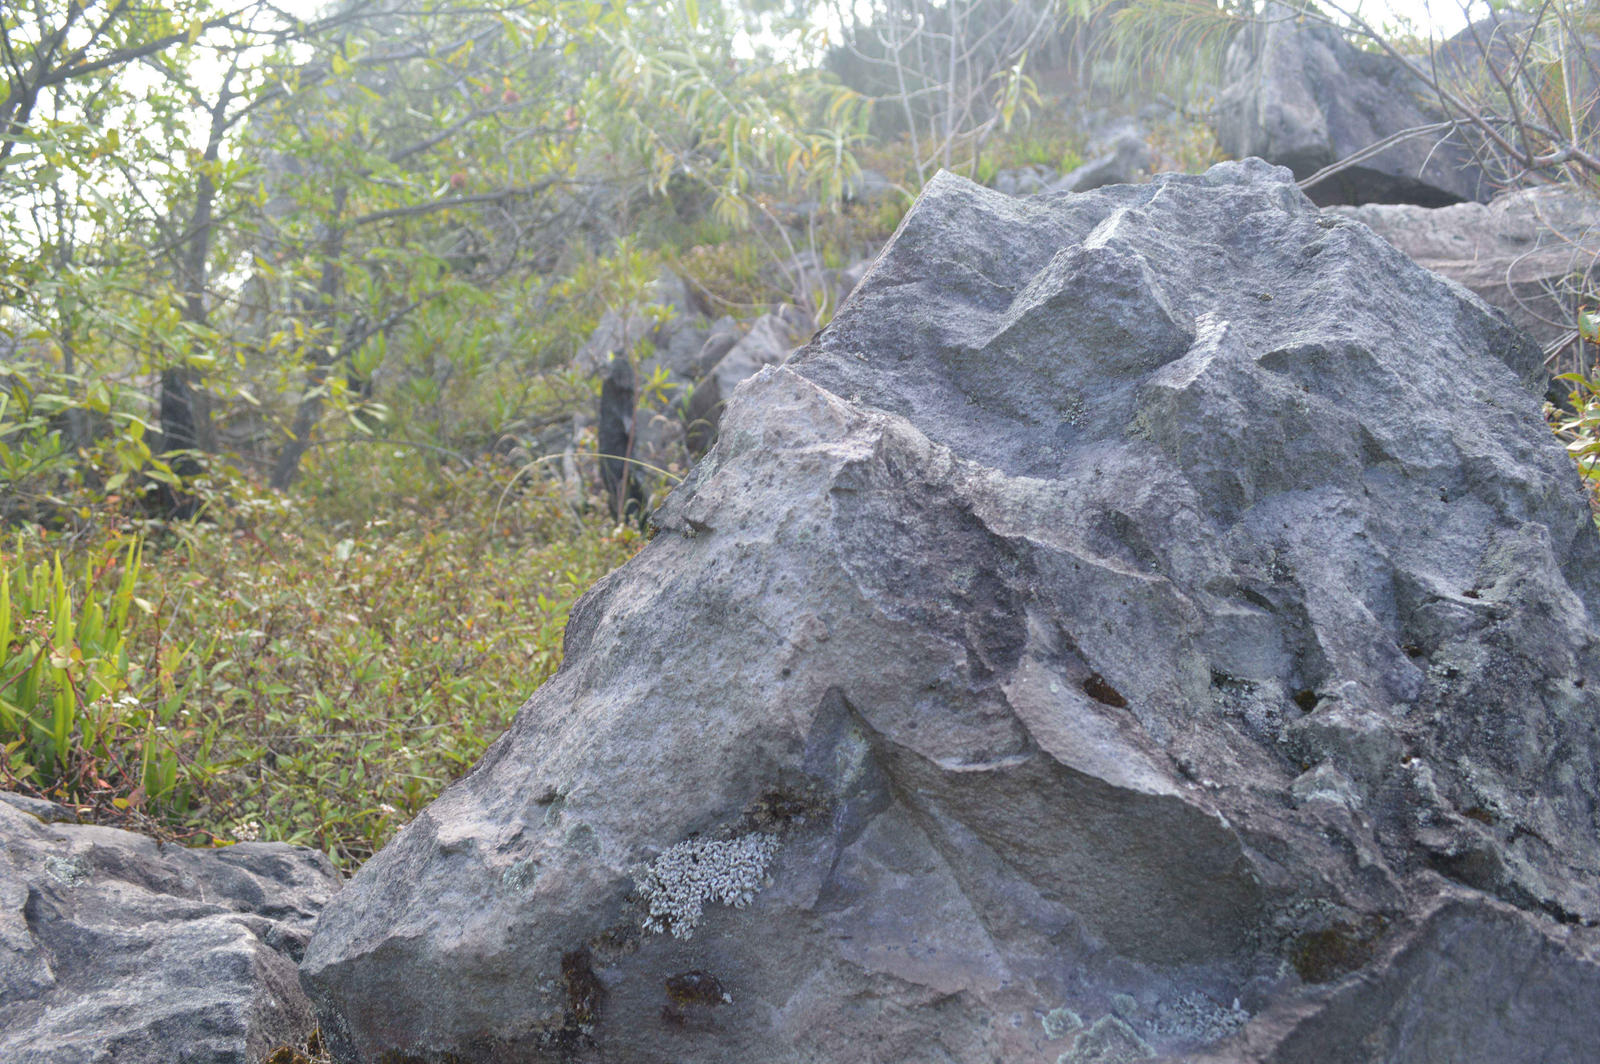 Stone3 By Adipancawh